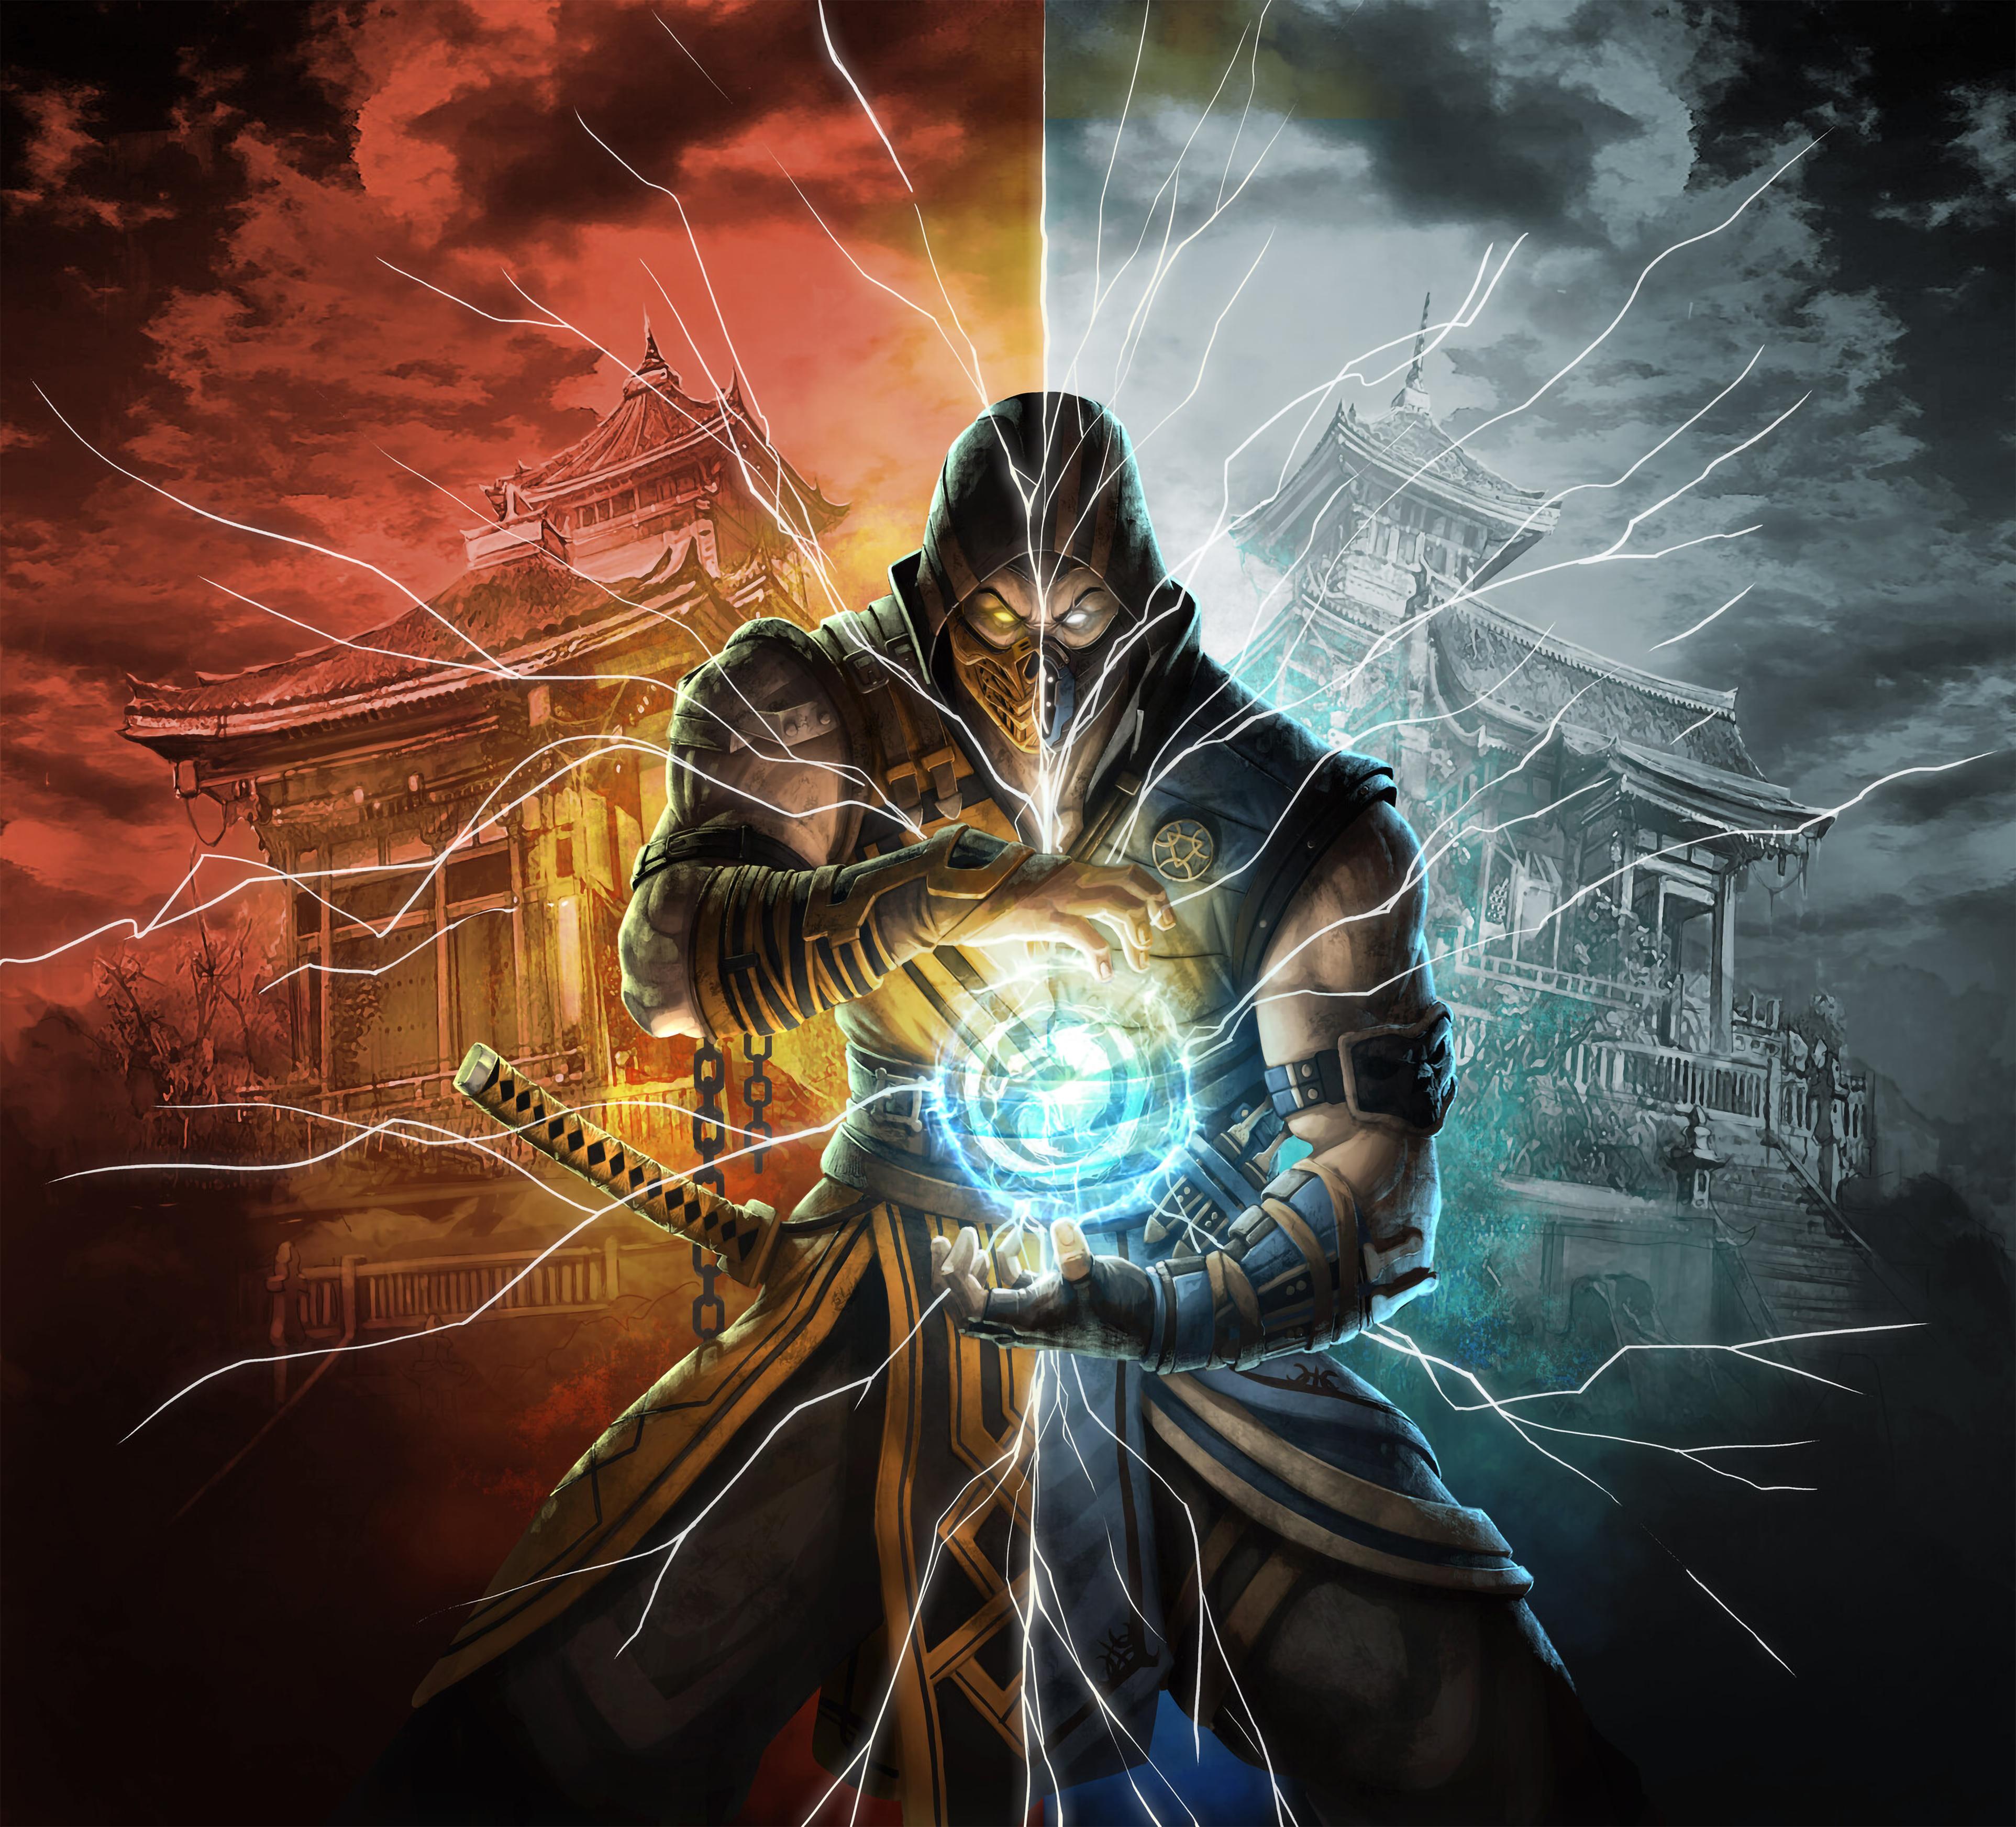 Mortal Kombat 11 Wallpaper, HD Games 4K Wallpapers, Images